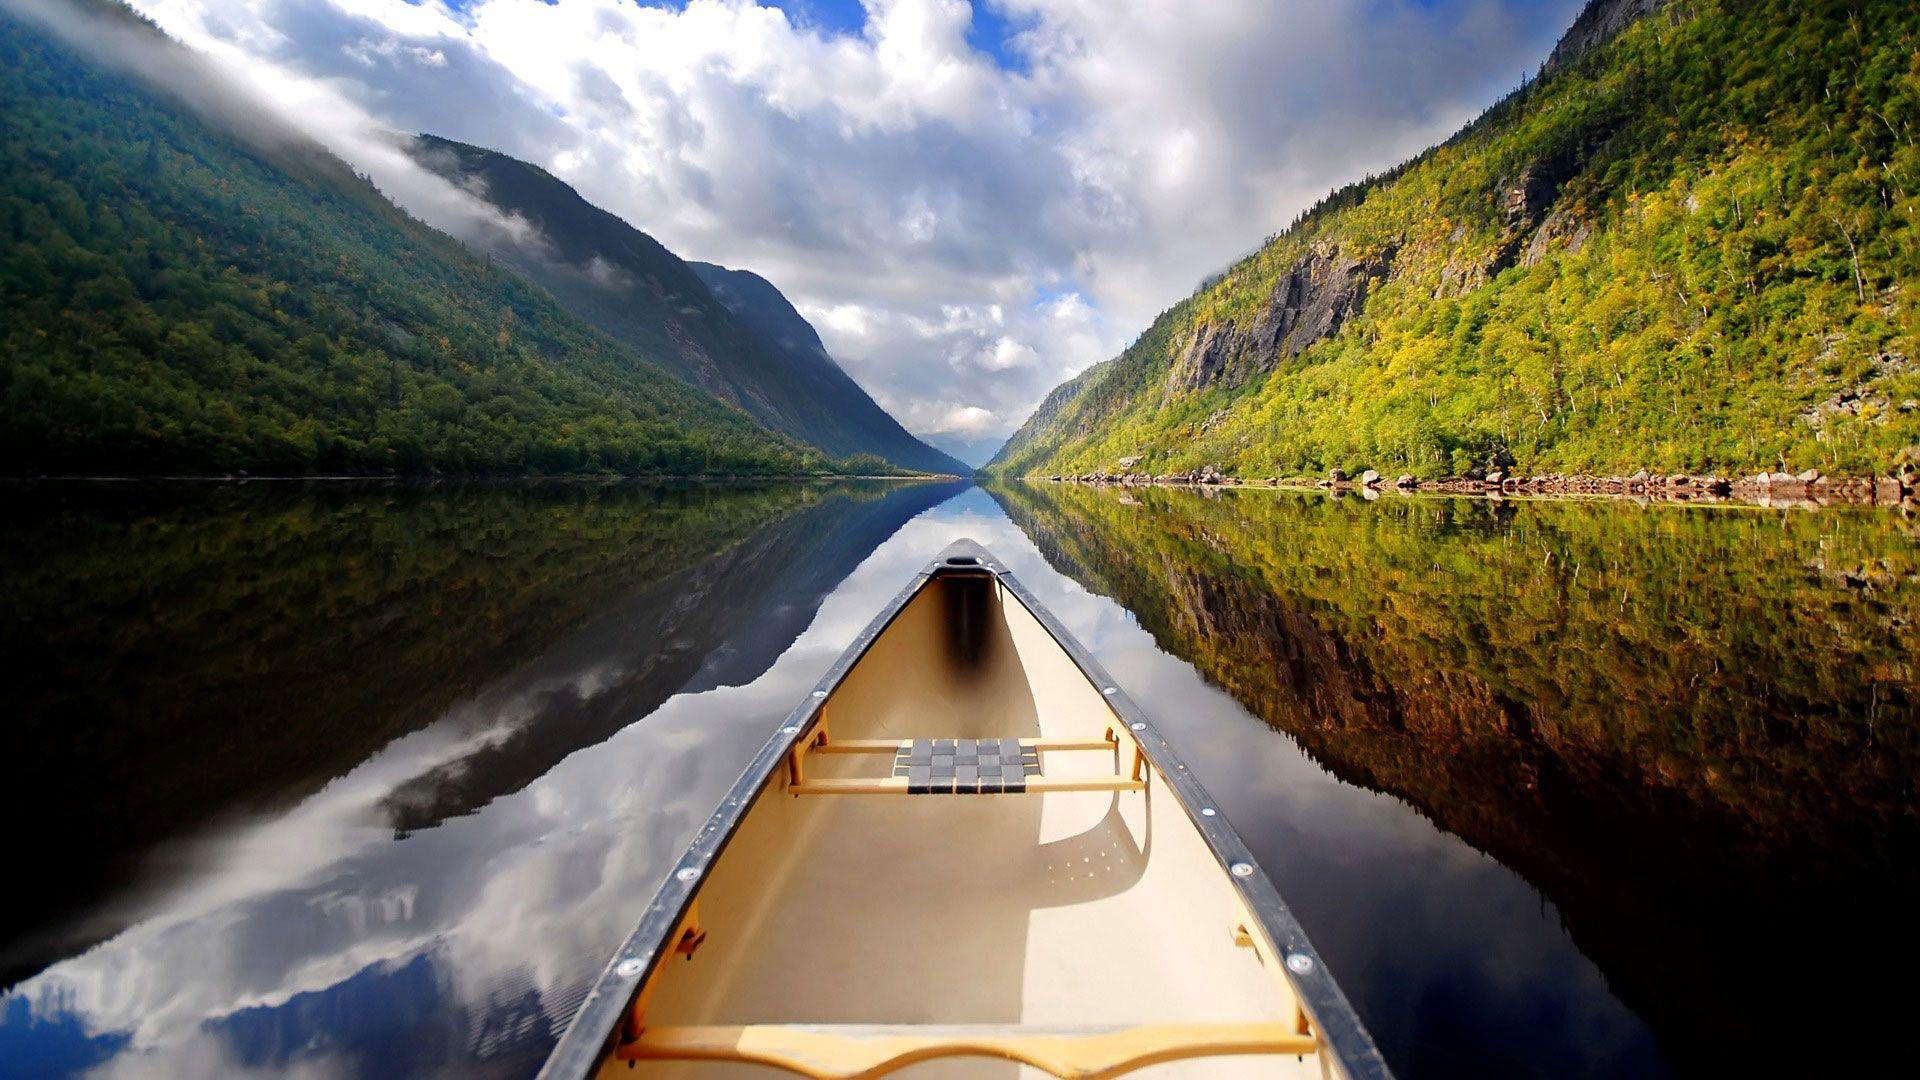 Hd Pics Photos Beautiful Landscape Mountain Lake Boat Hd Quality Desktop Background Wallpaper Beautiful Places Cool Photos Nature Photography